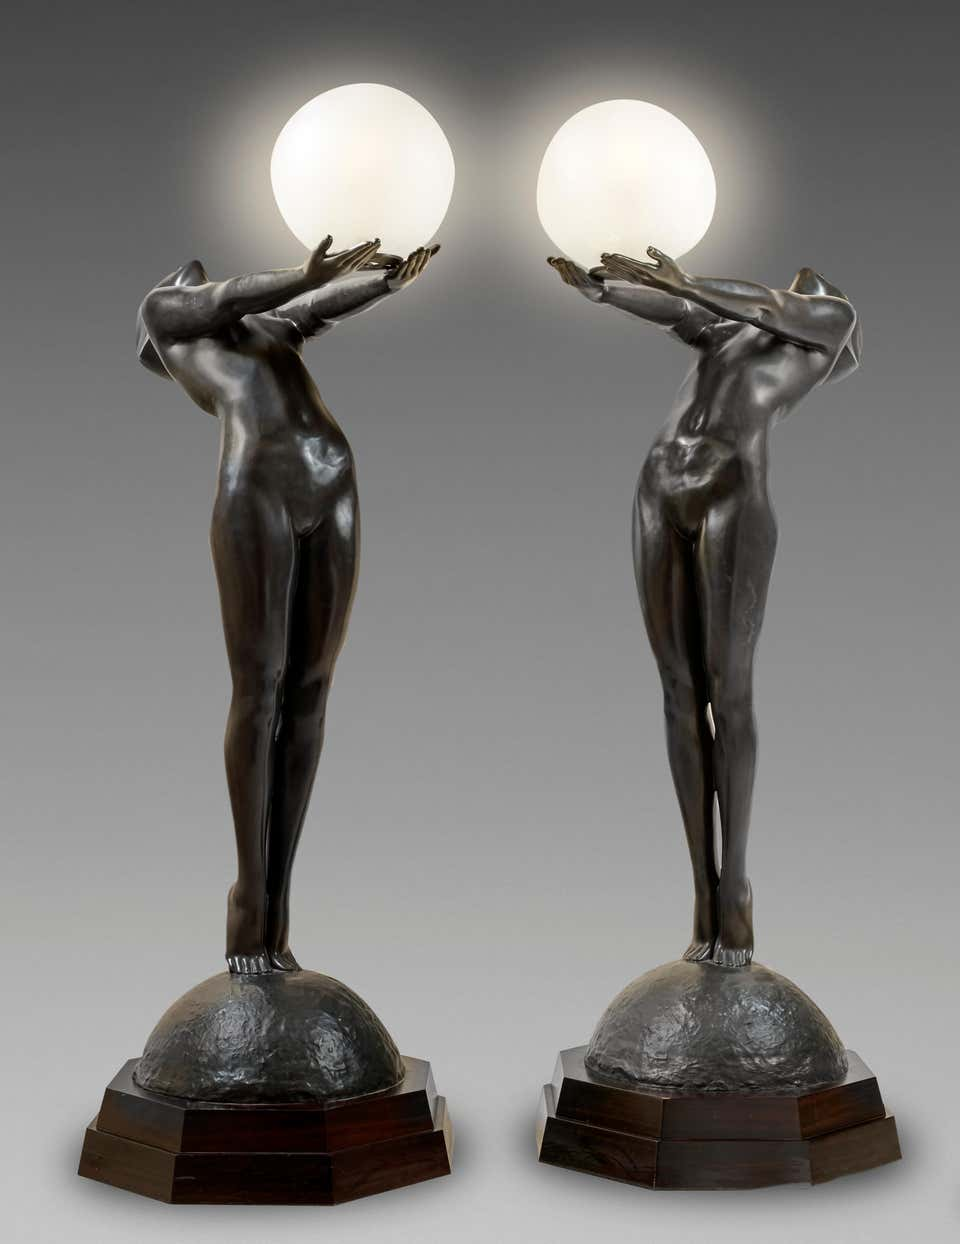 Original Bronze Statue of 3 Men by Pierre LaFaguays at 1stdibs